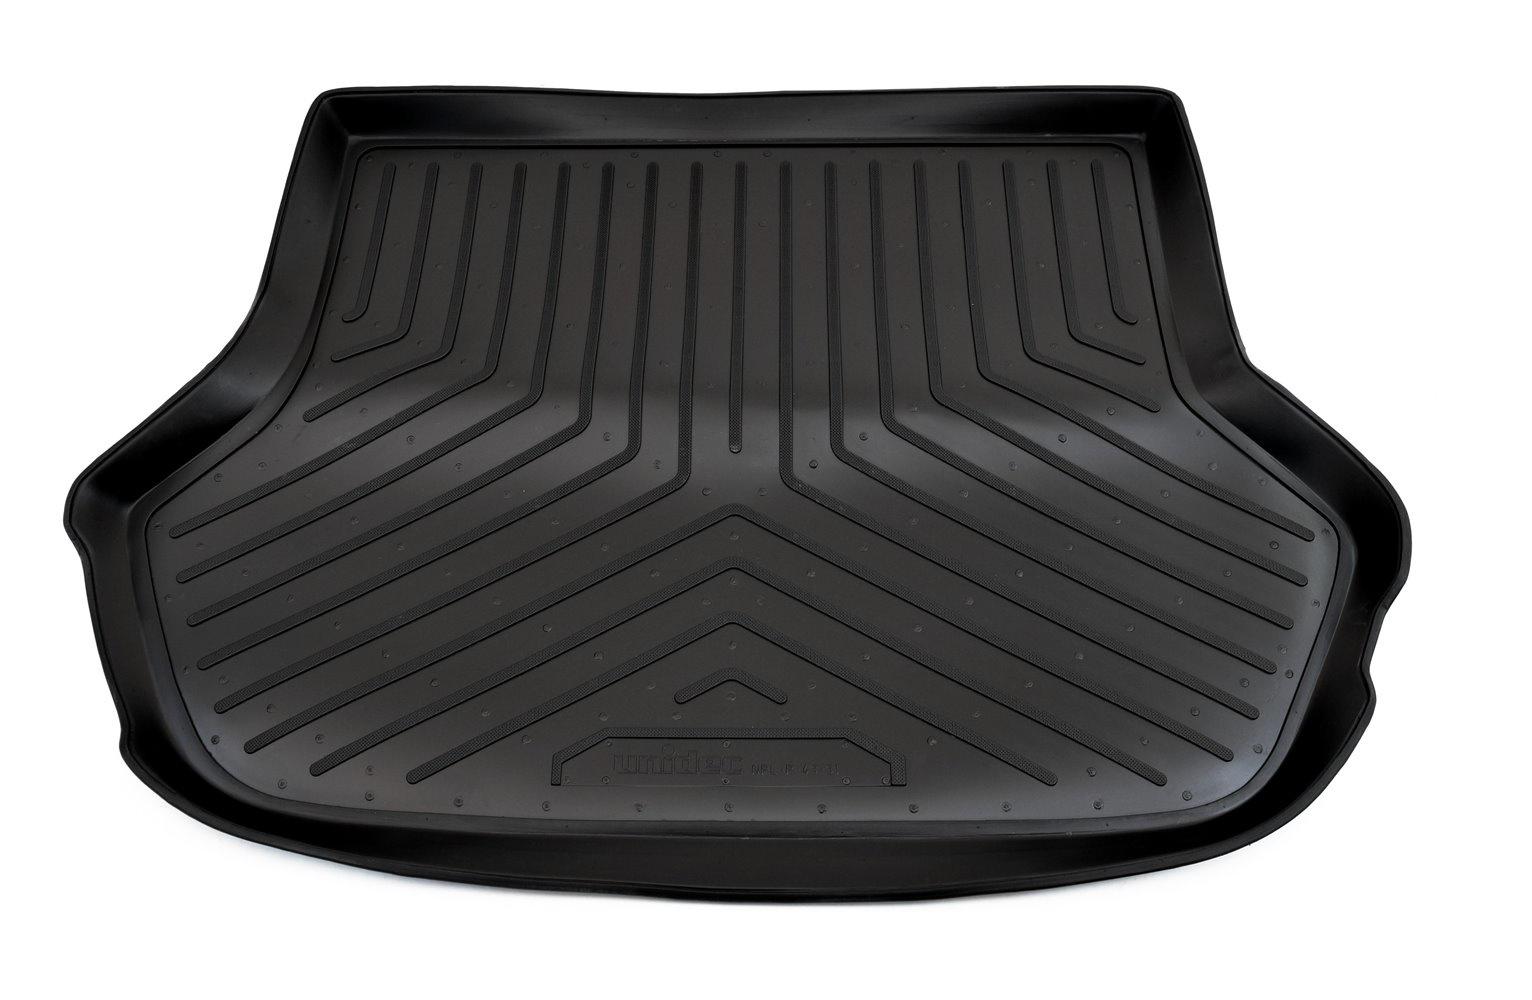 Коврик багажника Norplast для Kia Rio DC HB 2000-2005, NPL-P-43-31, черный